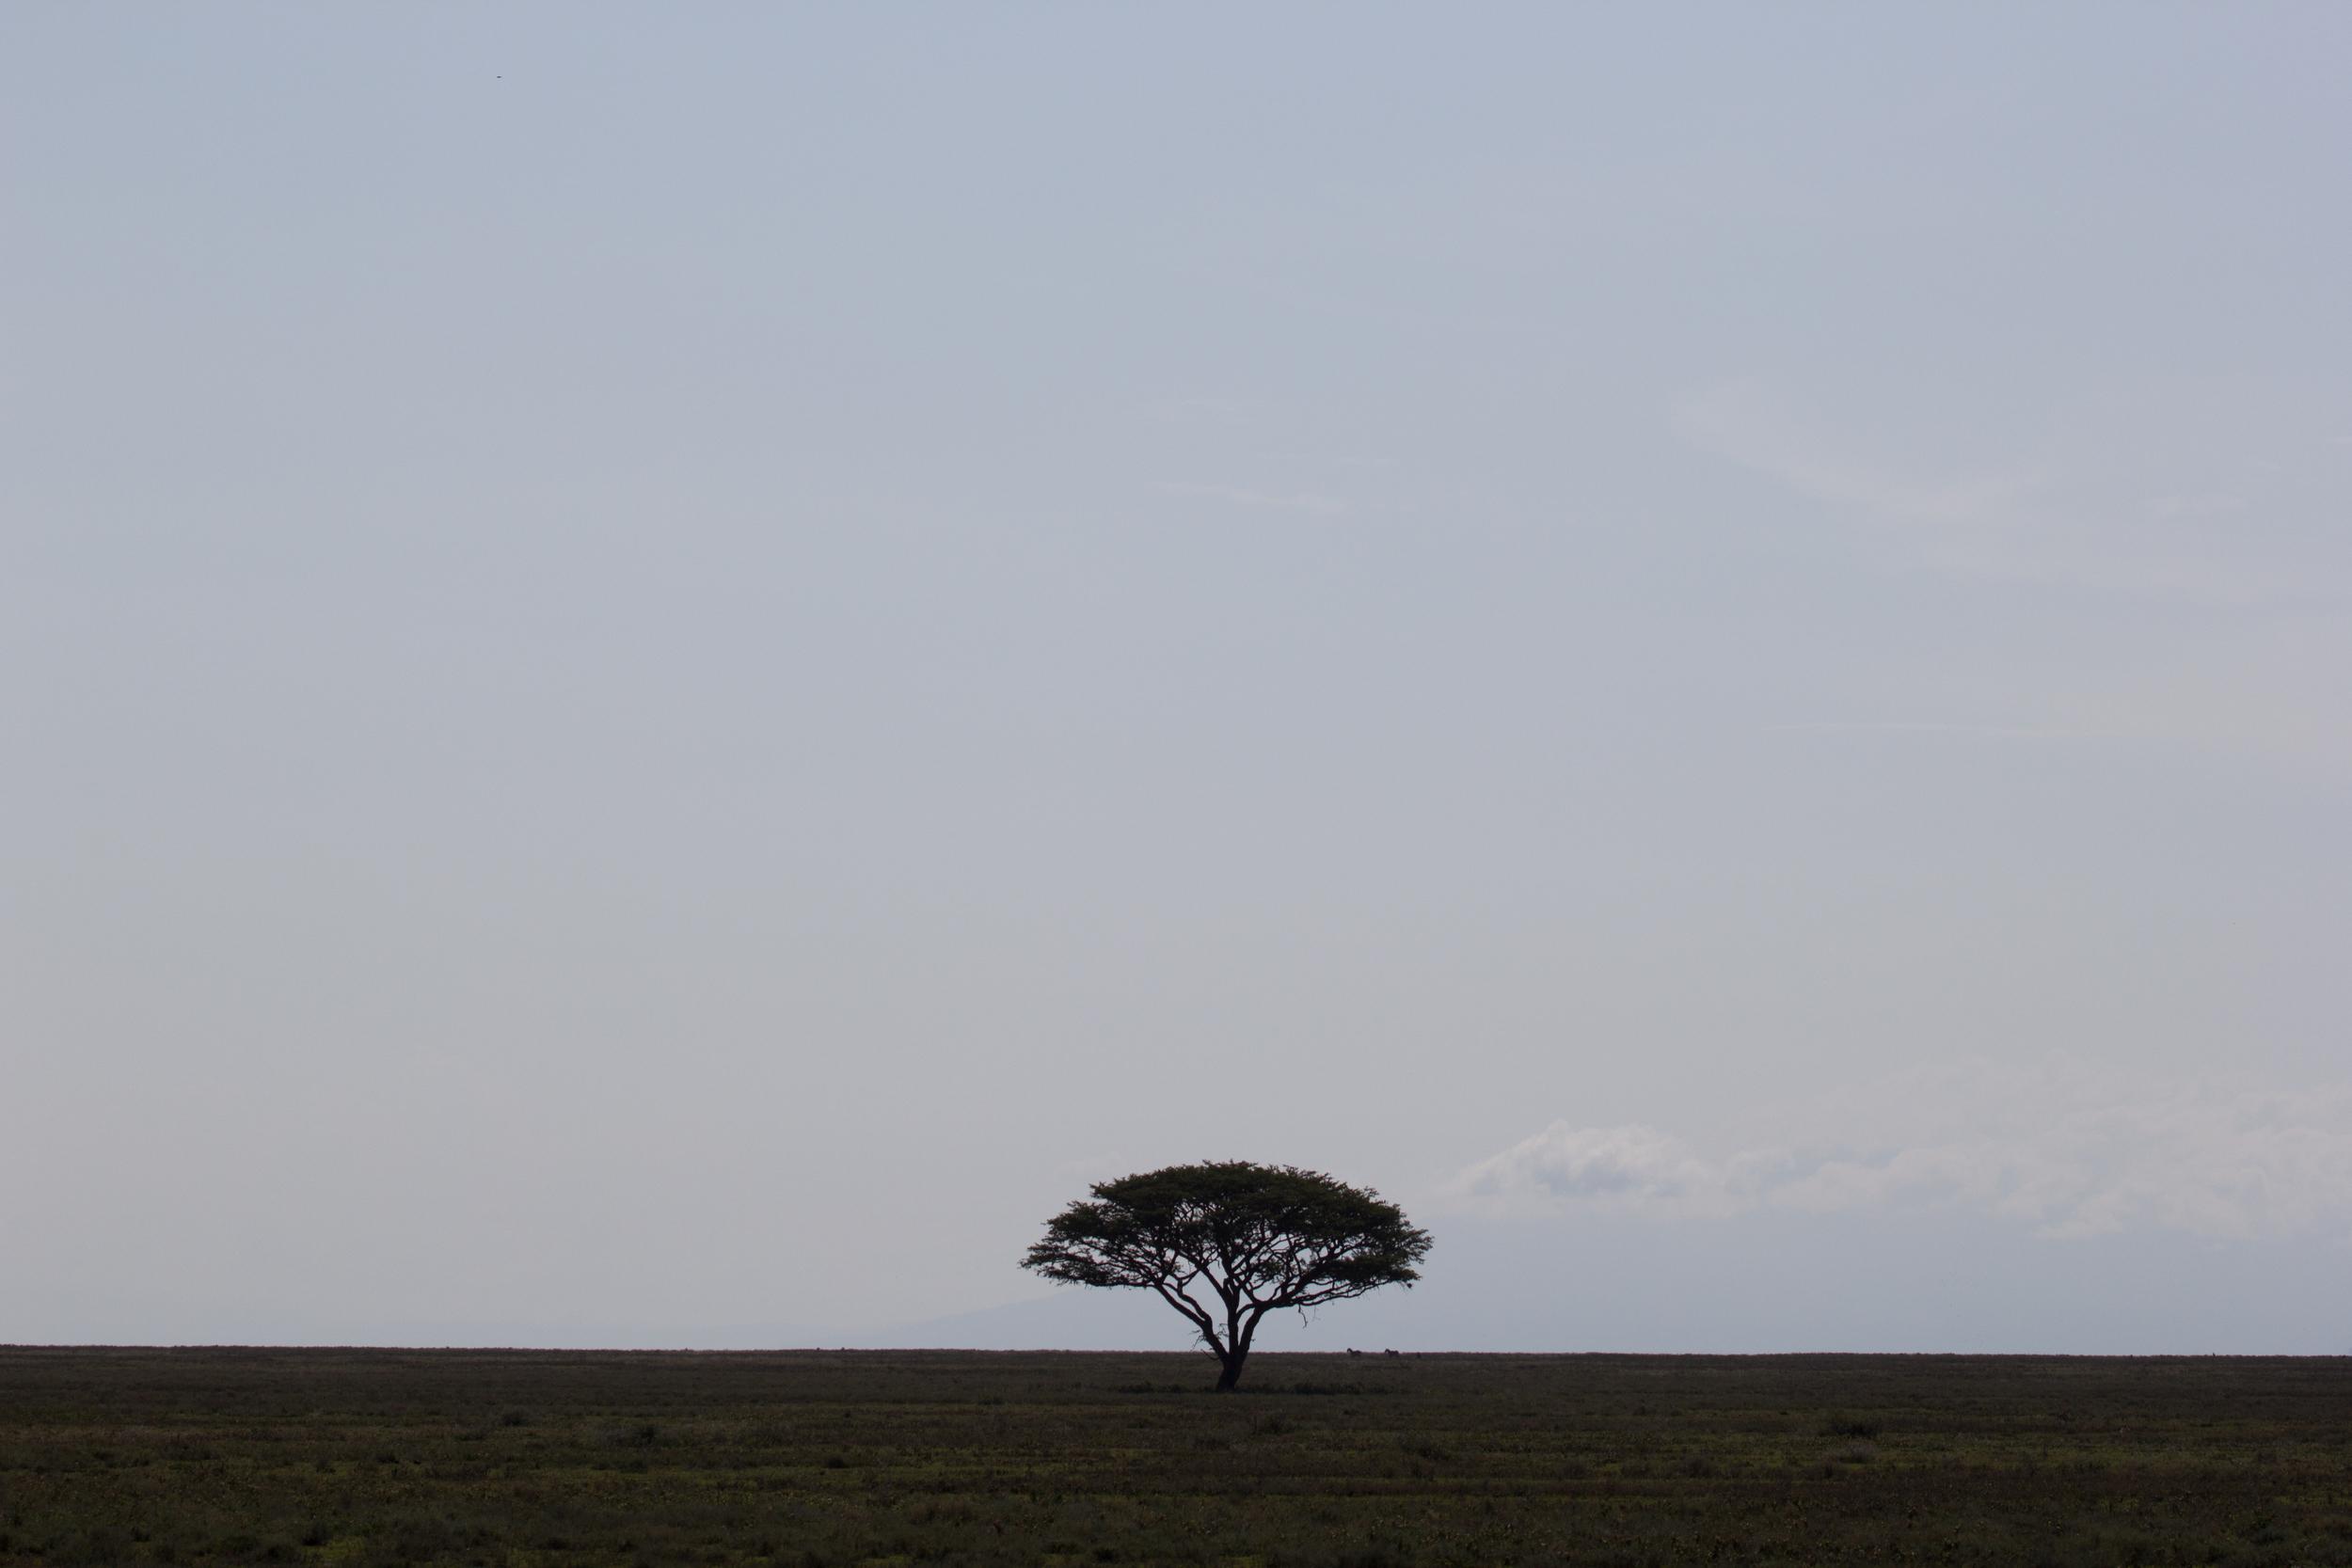 Acacia on Serengeti